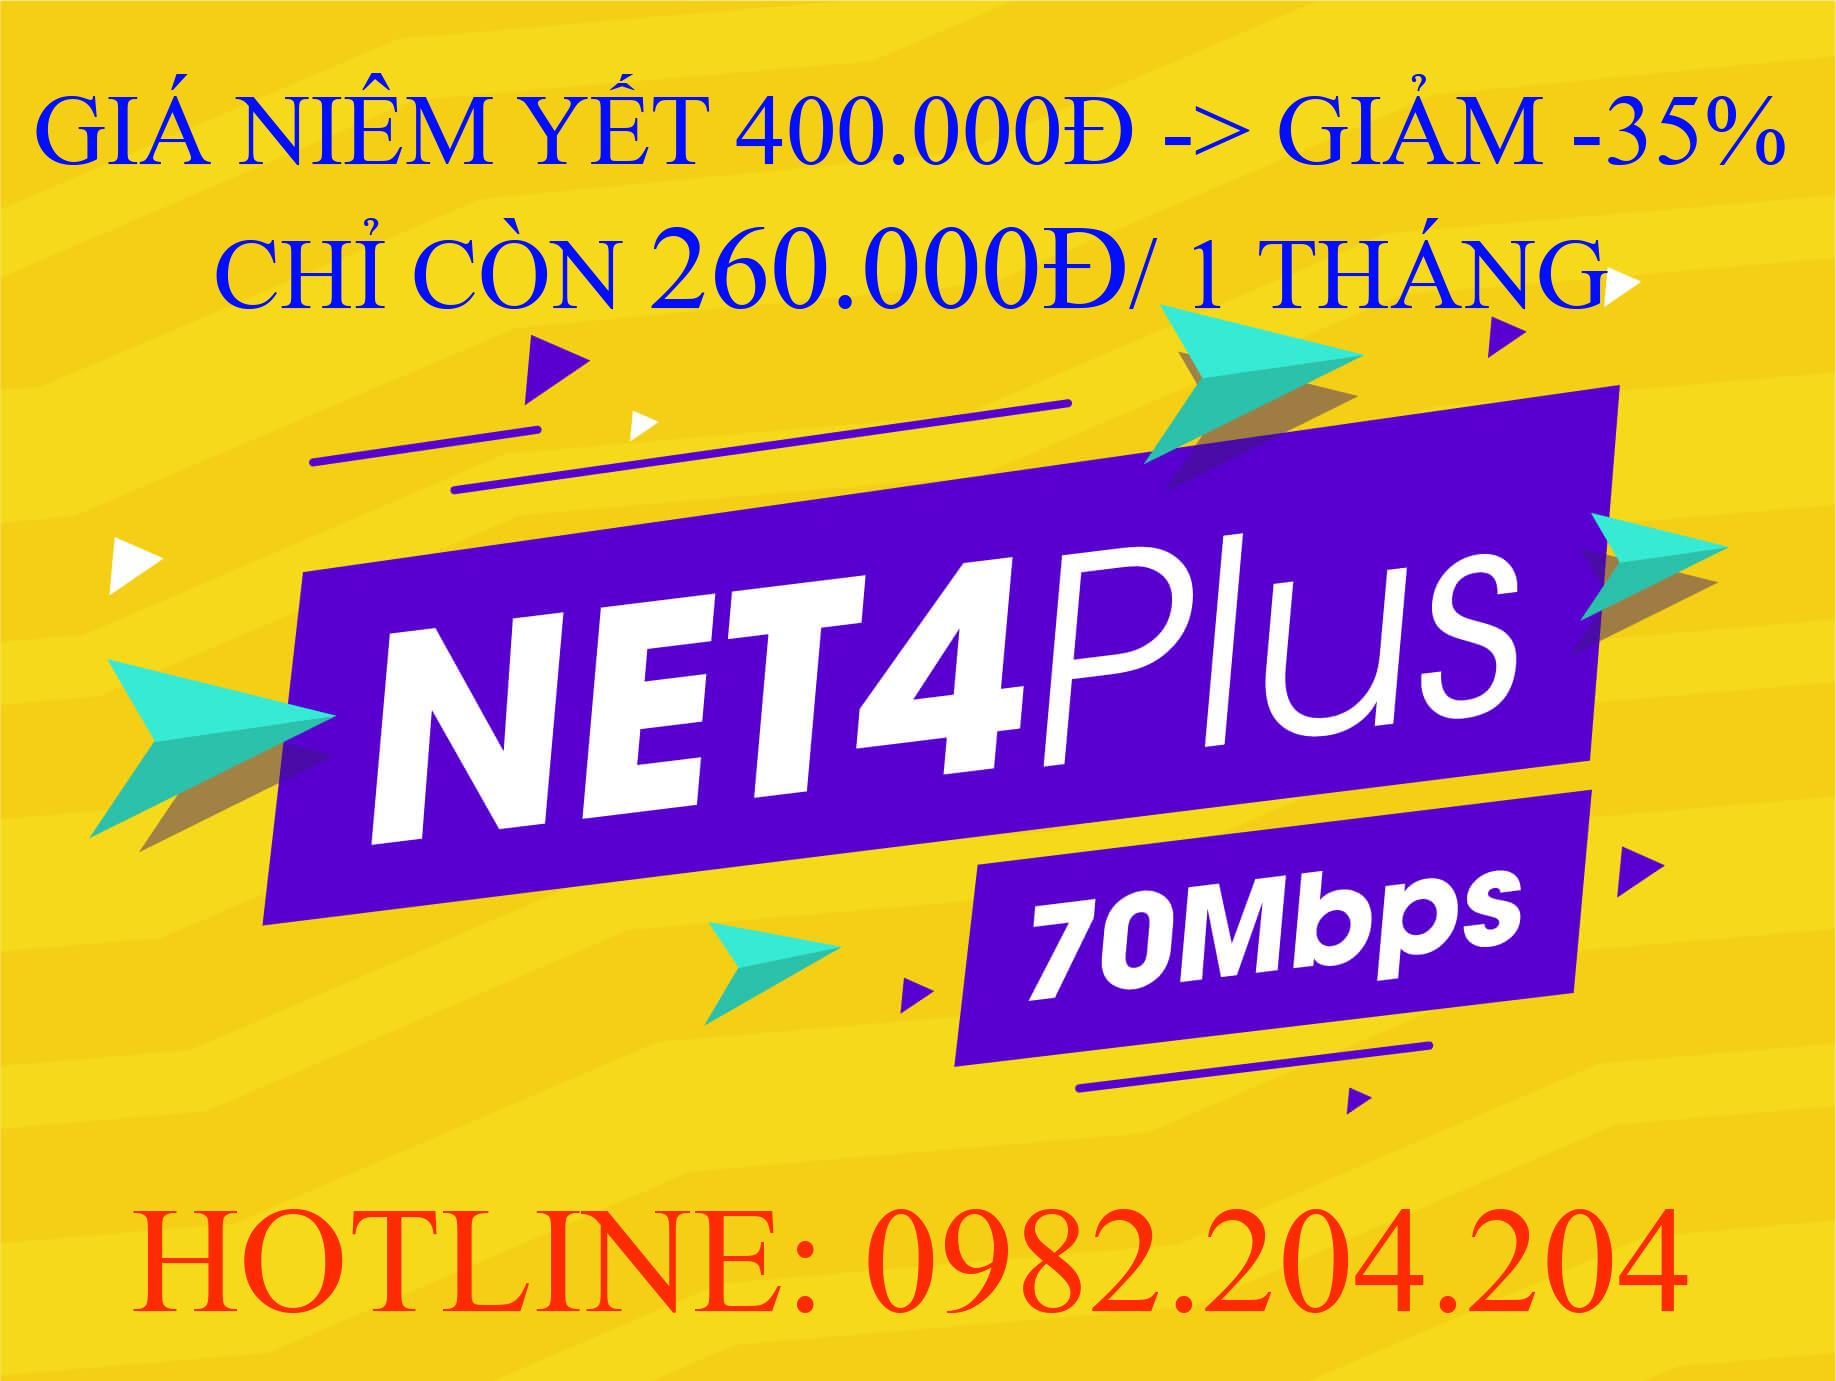 Lắp Mạng Viettel Gói Net 4 plus